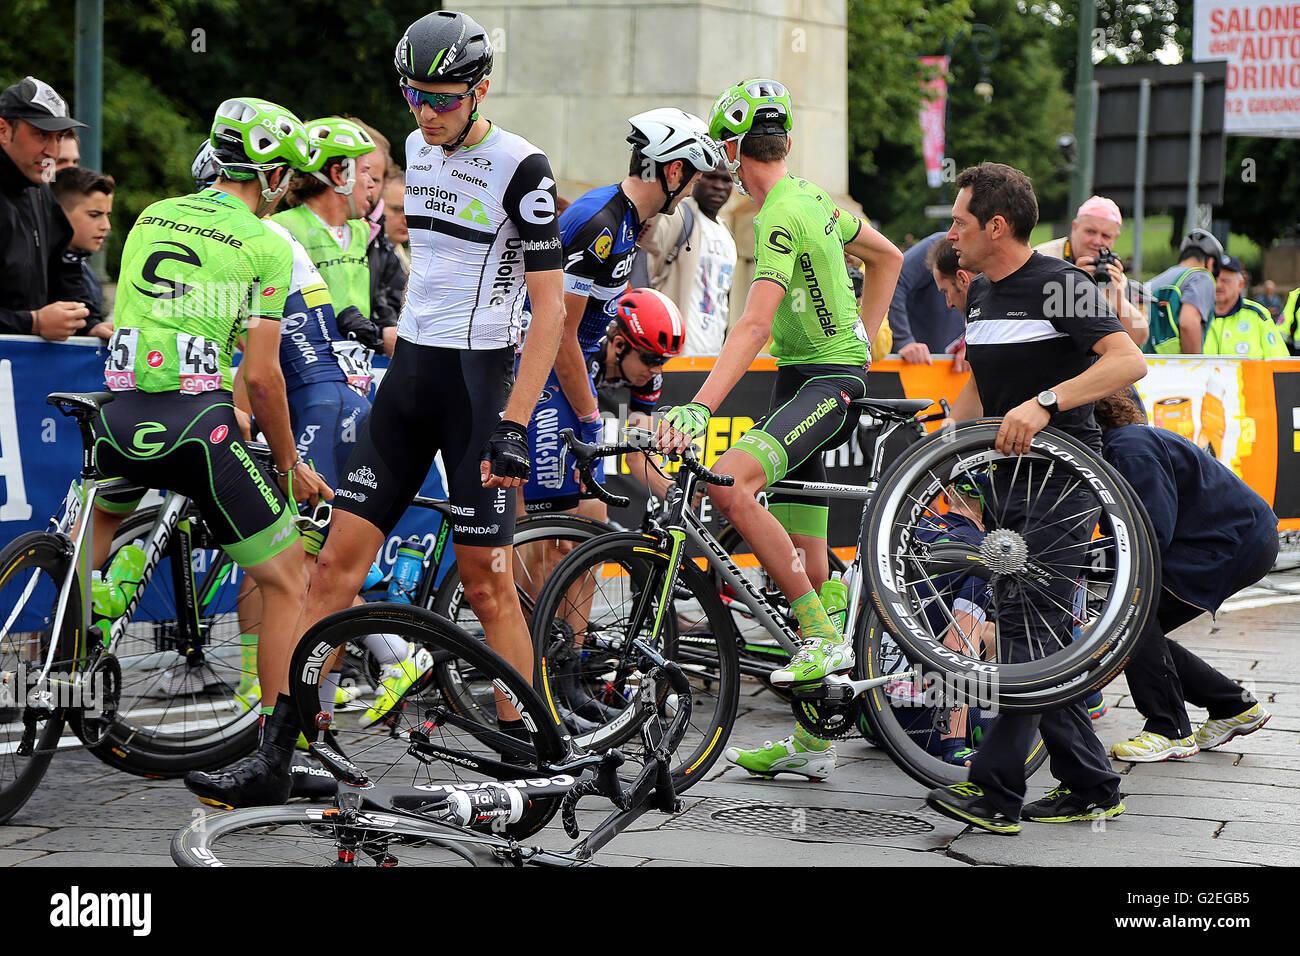 https://c8.alamy.com/comp/G2EGB5/torino-italy-29th-may-2016-the-home-favorite-vincenzo-nibali-wins-G2EGB5.jpg